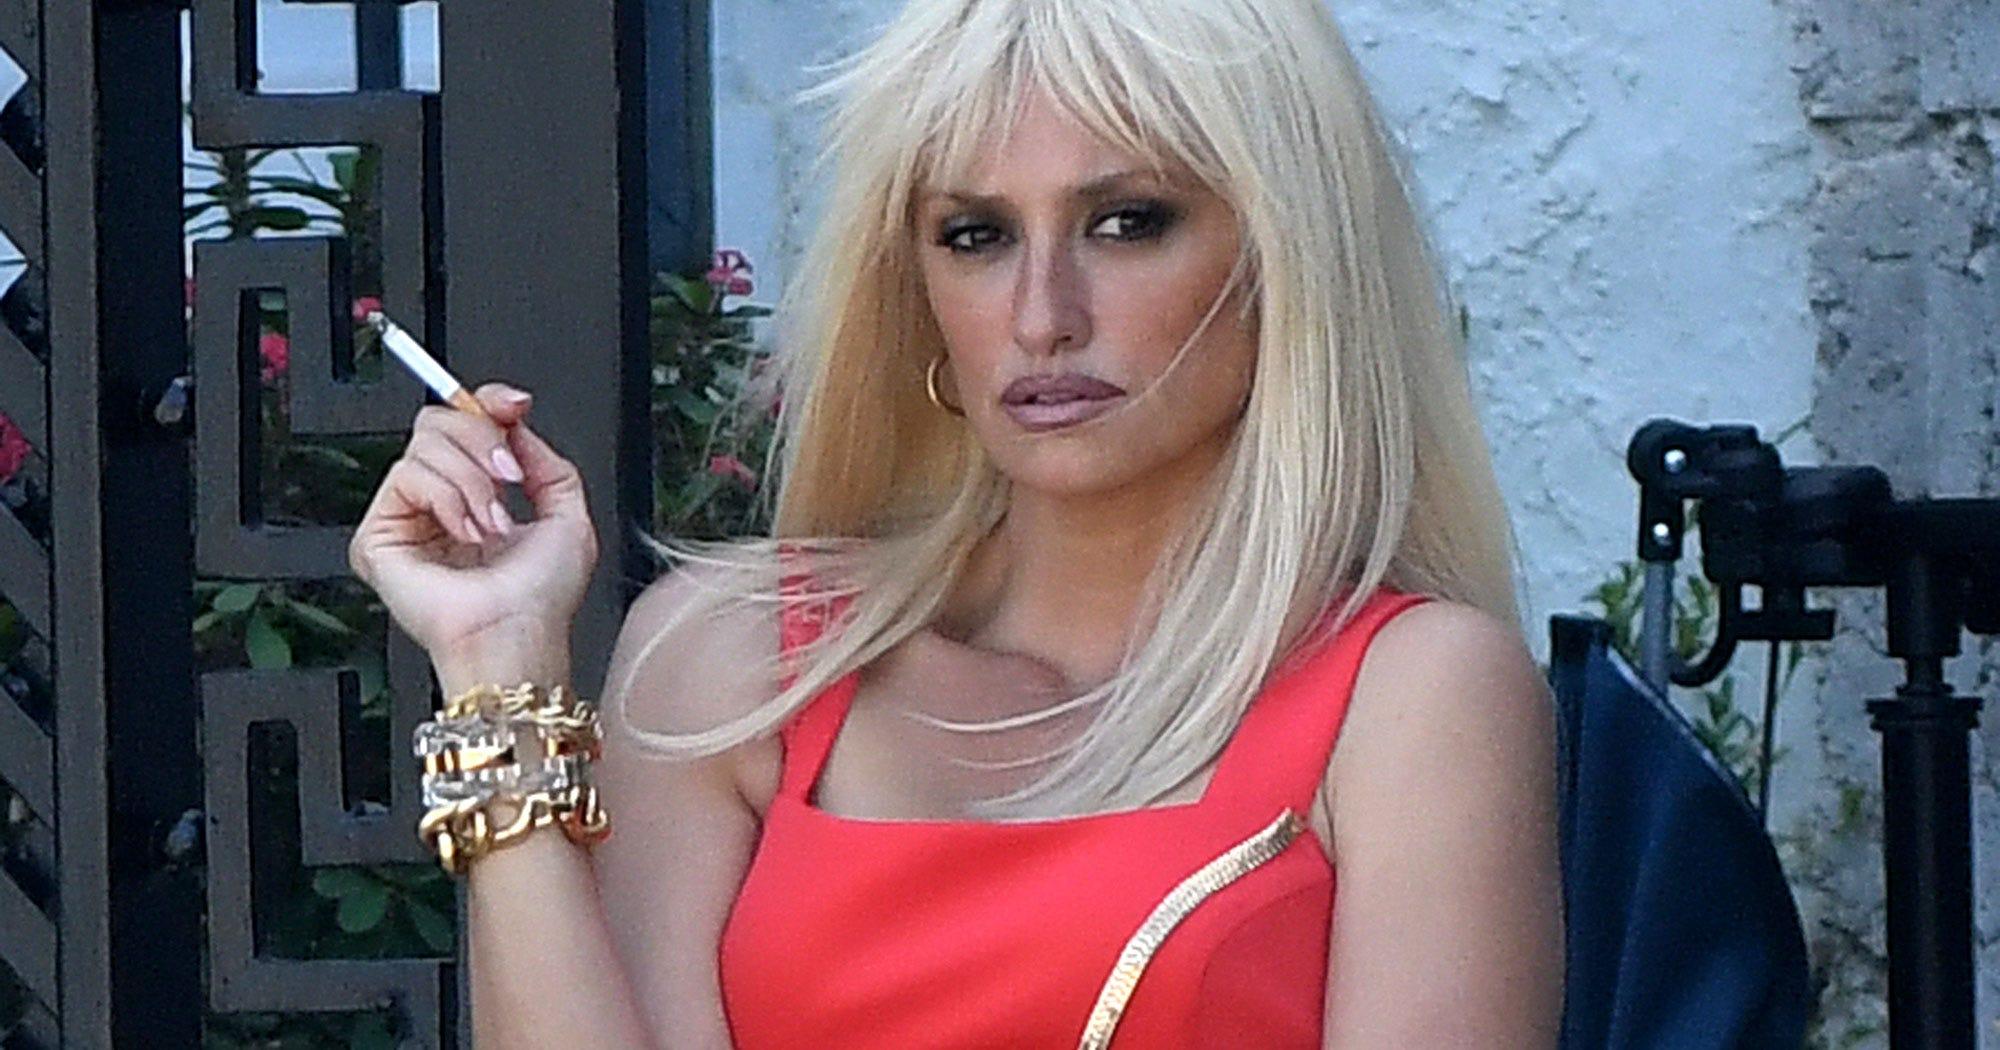 These Photos Of Penelope Cruz As Donatella Versace Are Unbelievable